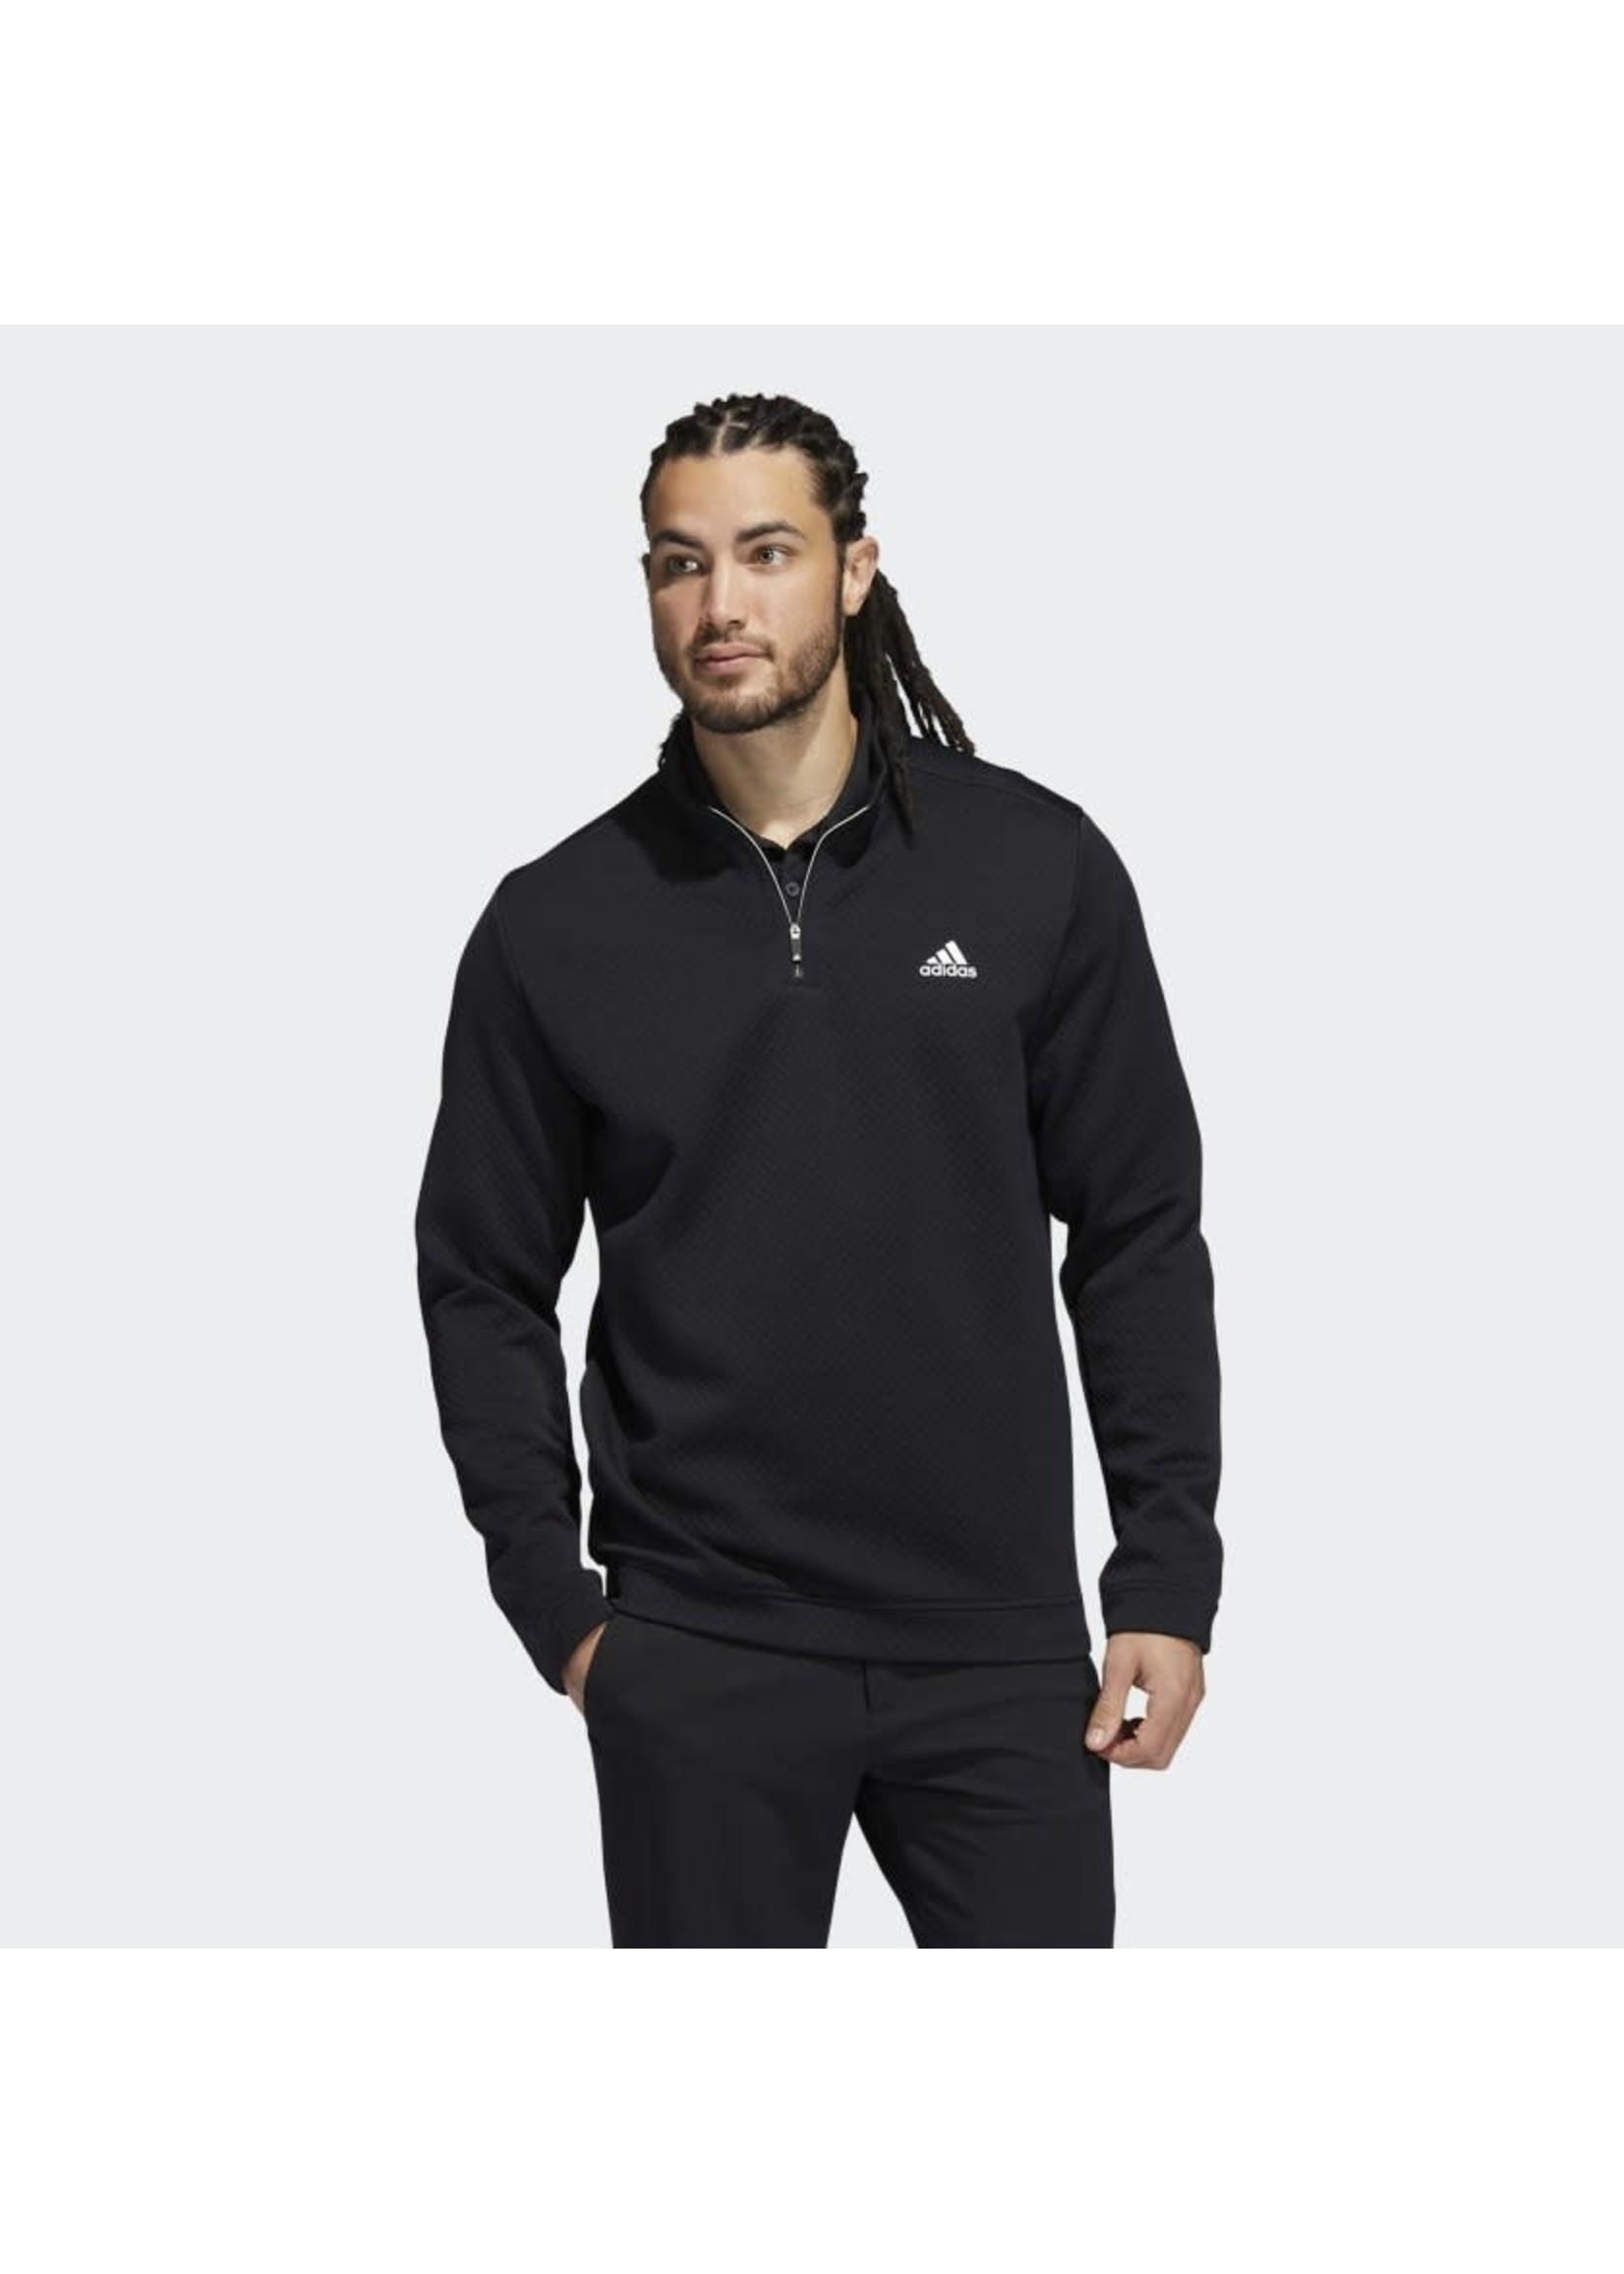 Adidas Adidas Prime Green Water Resistant Mens Golf Top (2021) - Black